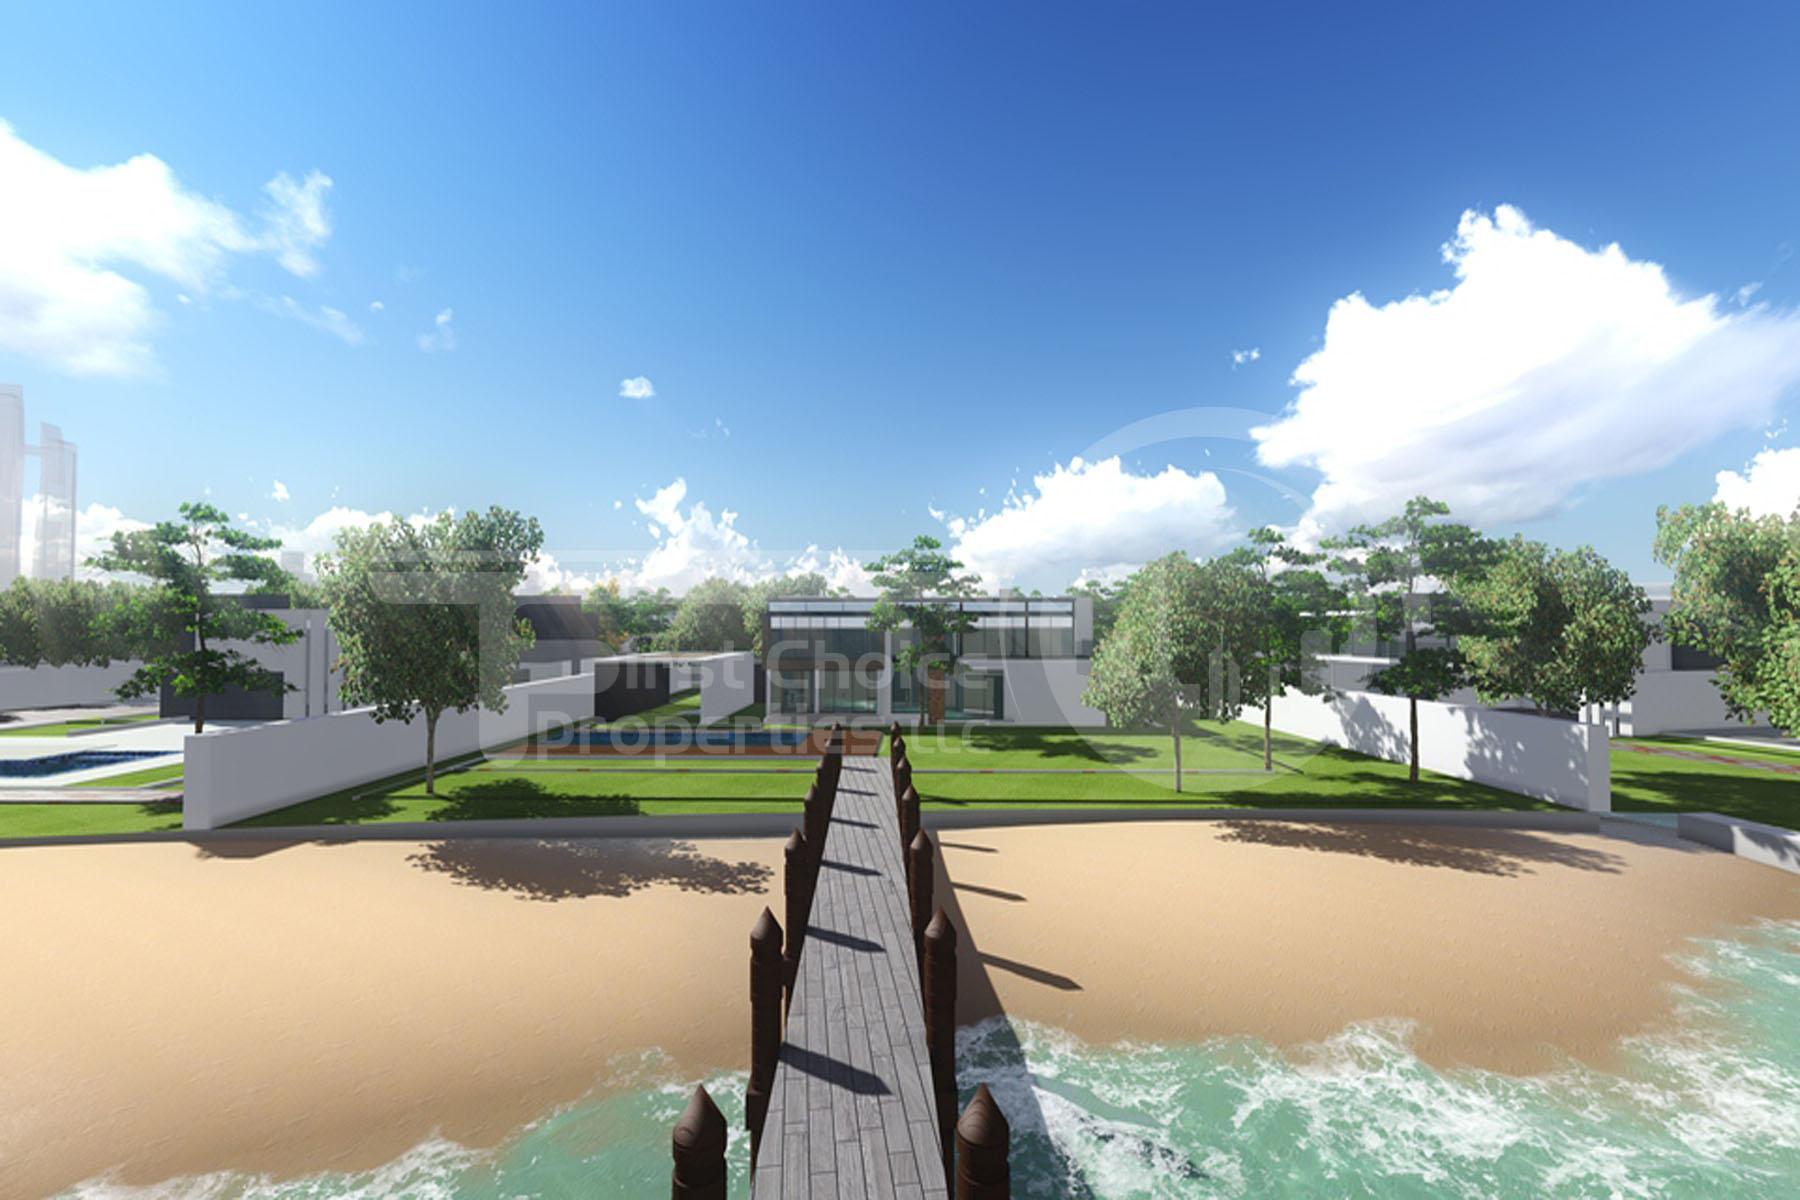 Residential Island - Nareel Island - Al Bateen - Abu Dhabi - UAE (6).jpg